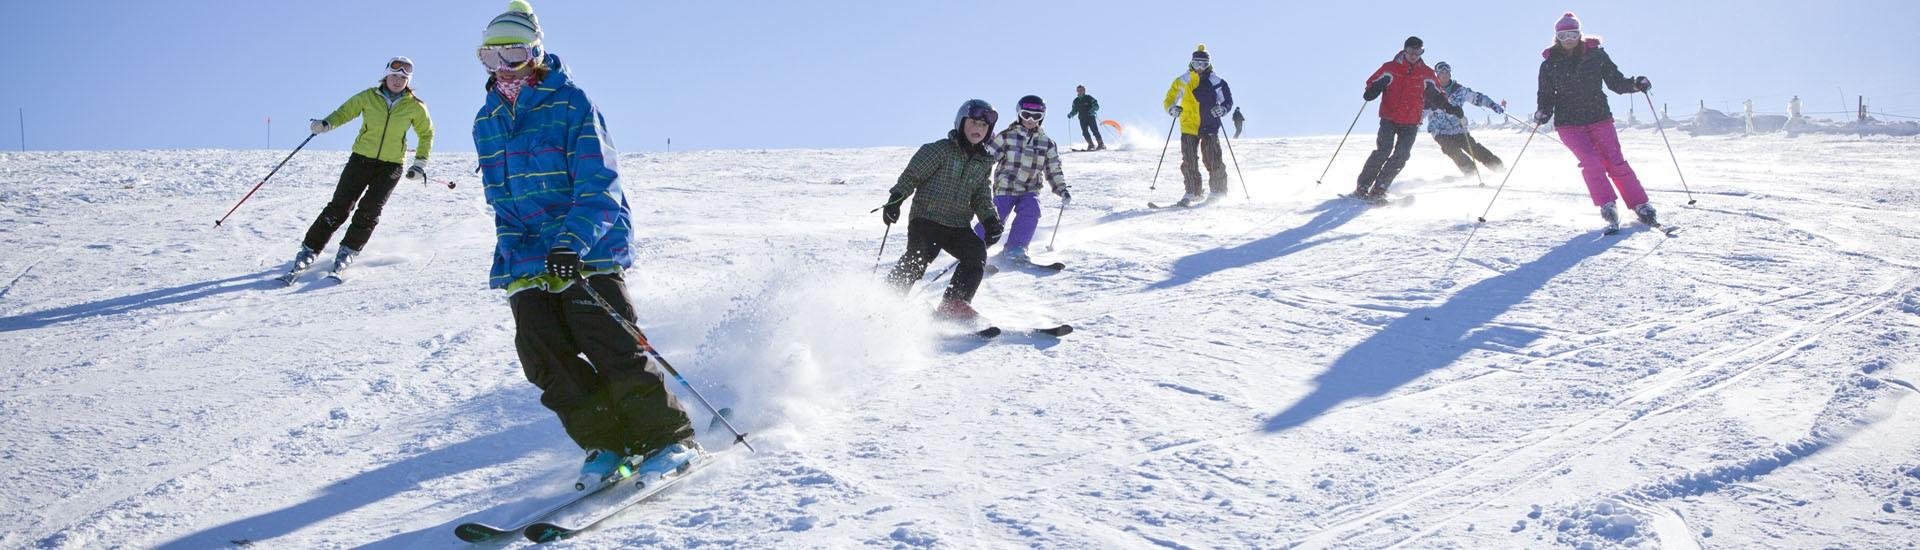 Ski Alpin La Bresse Hohneck hautes vosges